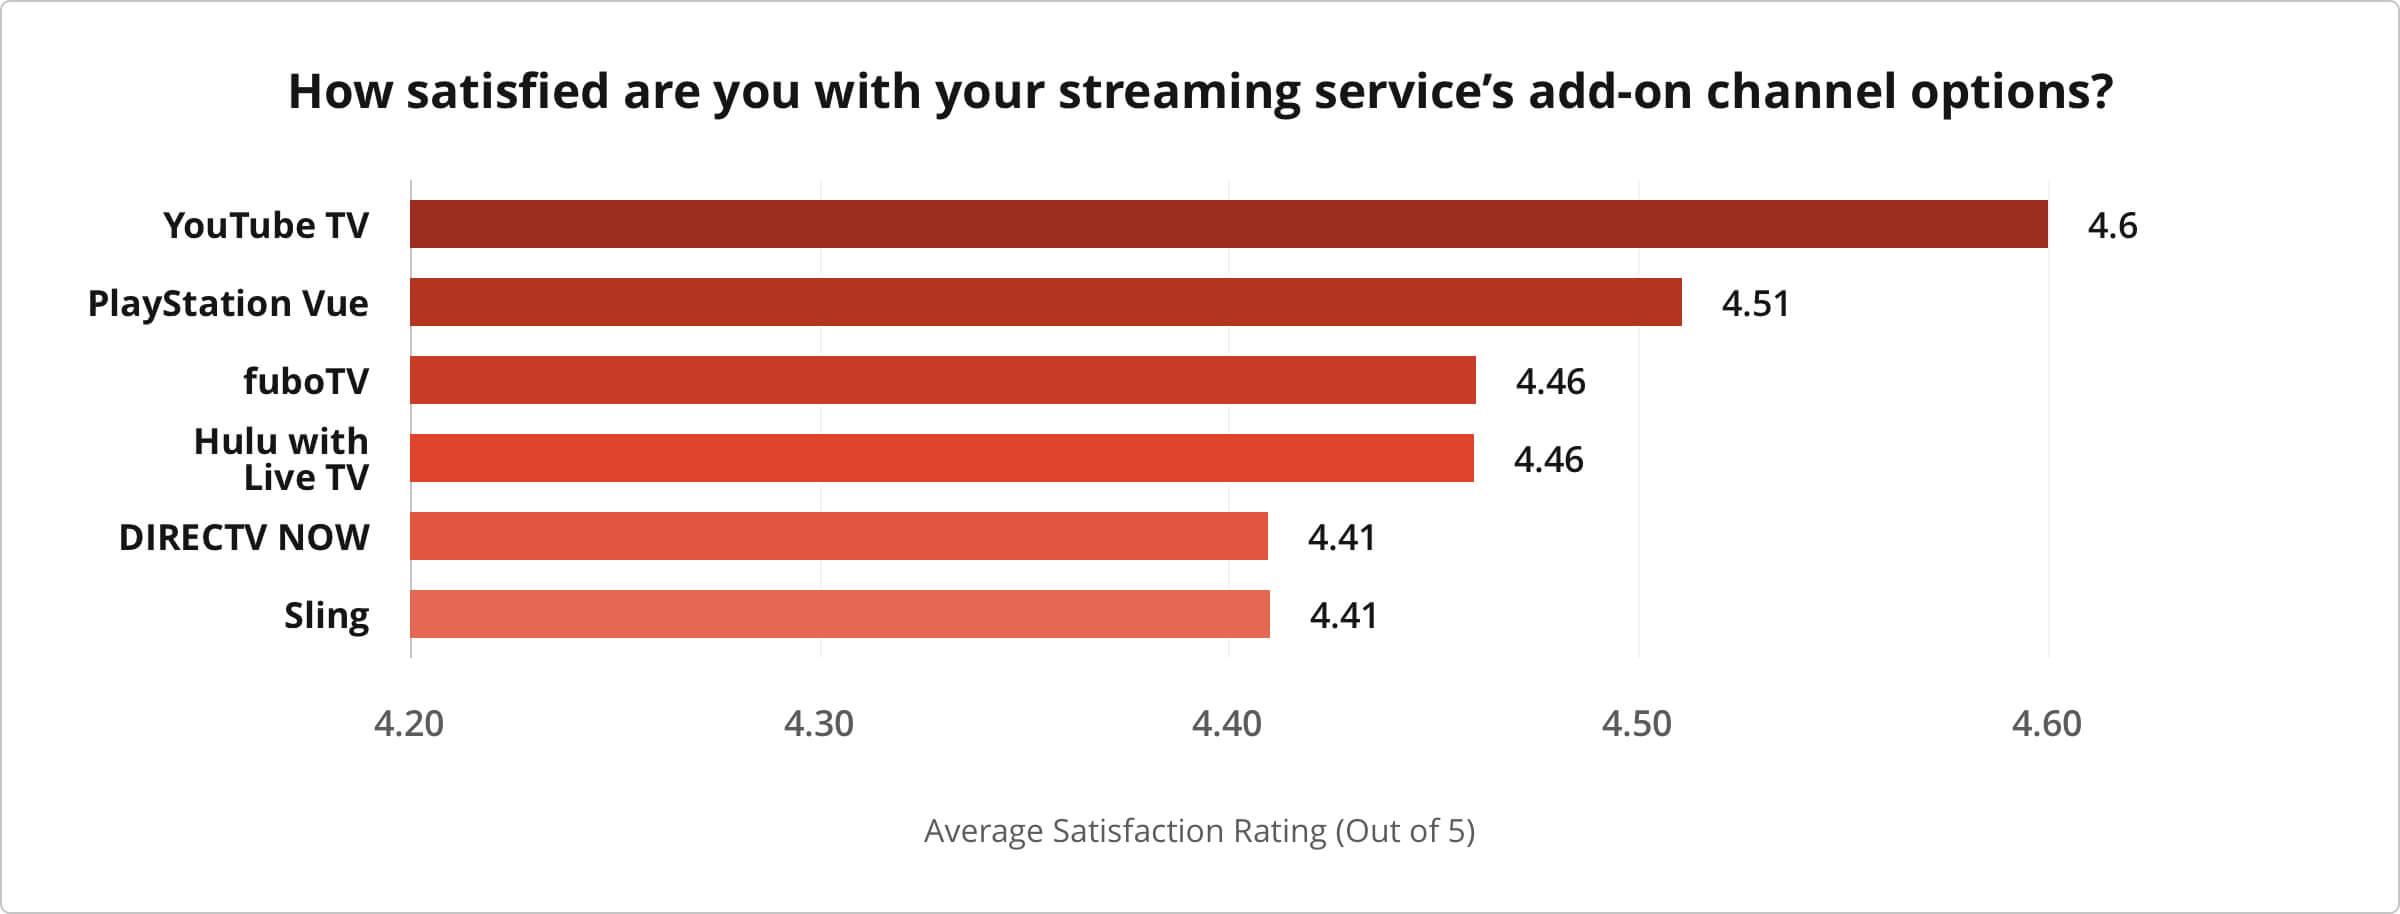 2019 Streaming TV Customer Satisfaction Survey | CableTV com